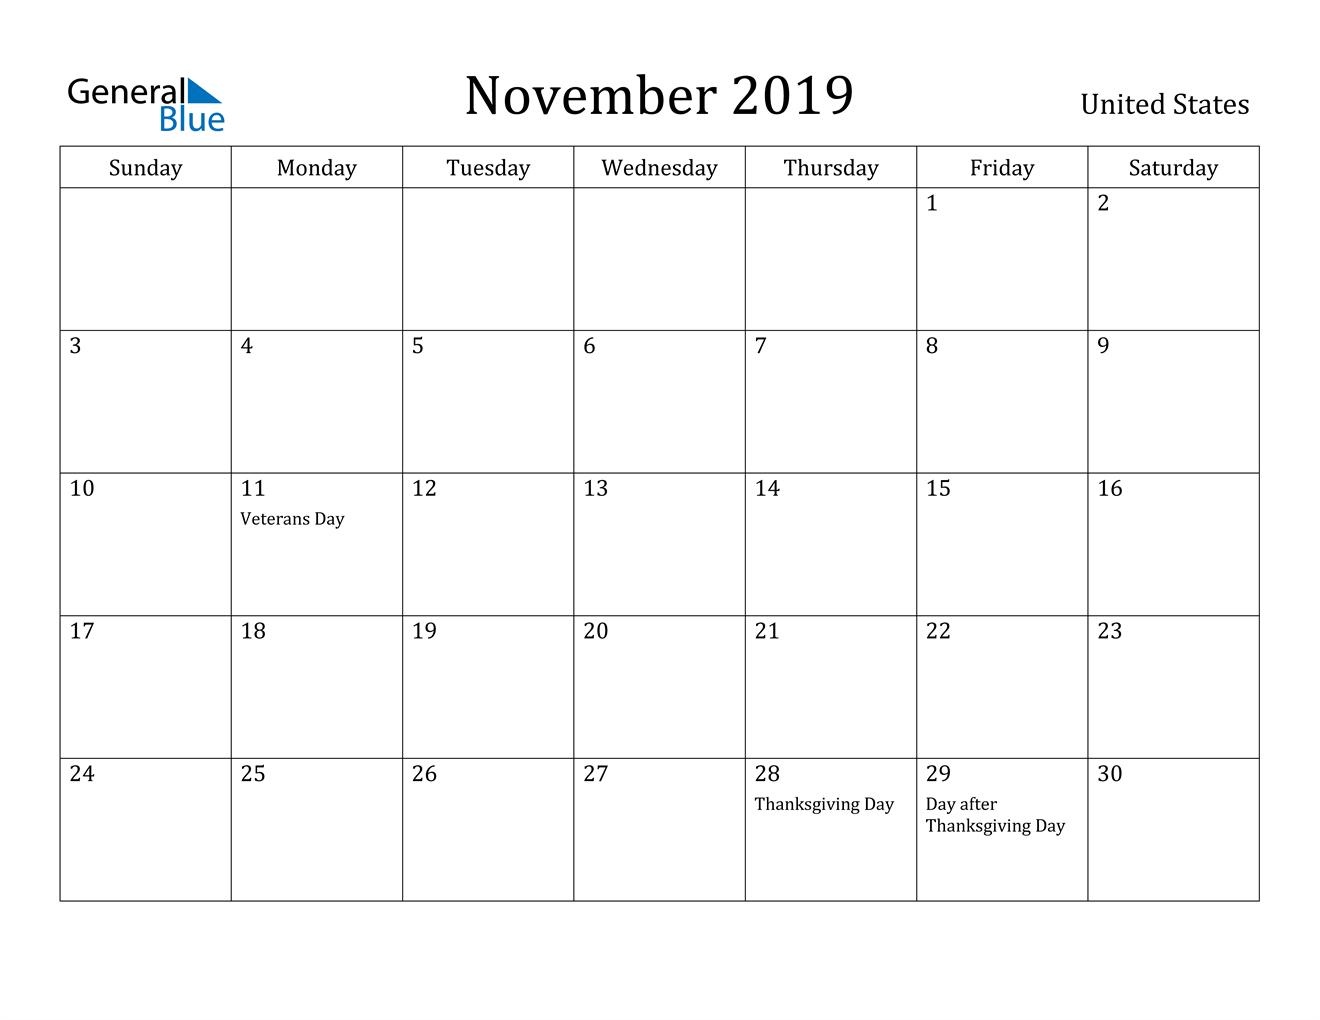 Image of November 2019 United States Calendar with Holidays Calendar